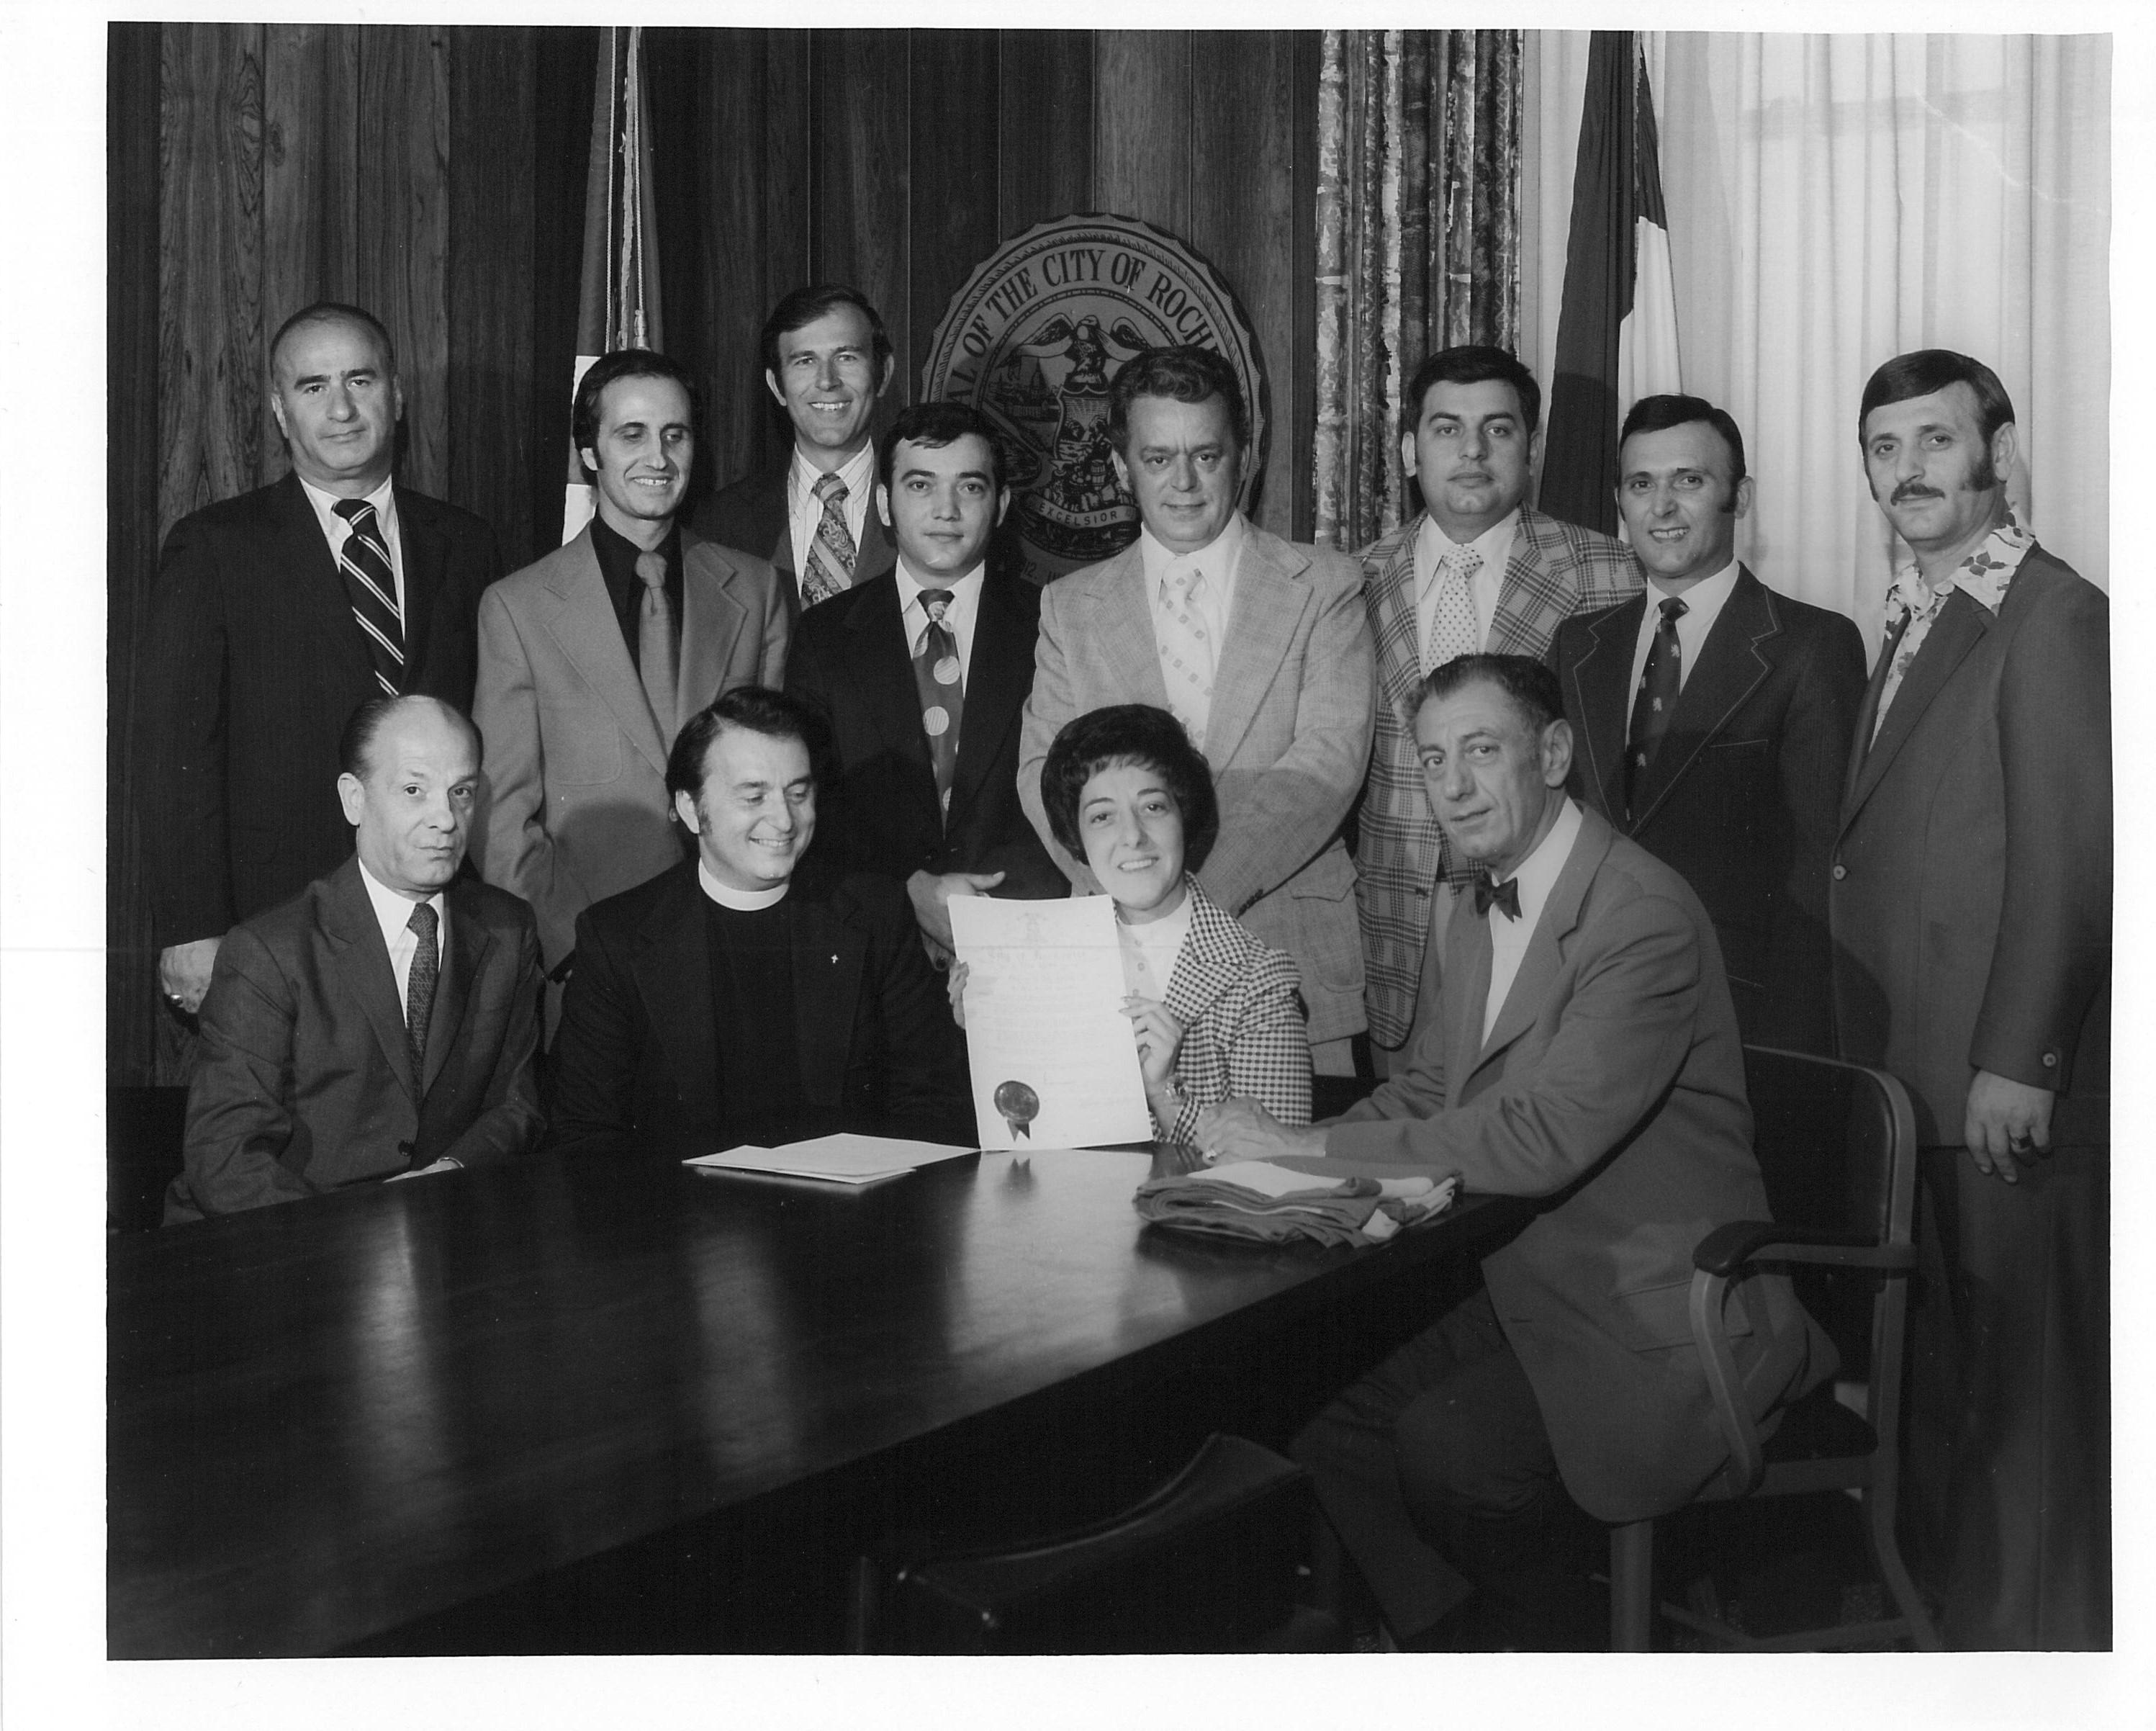 Photograph of Rochester City Council